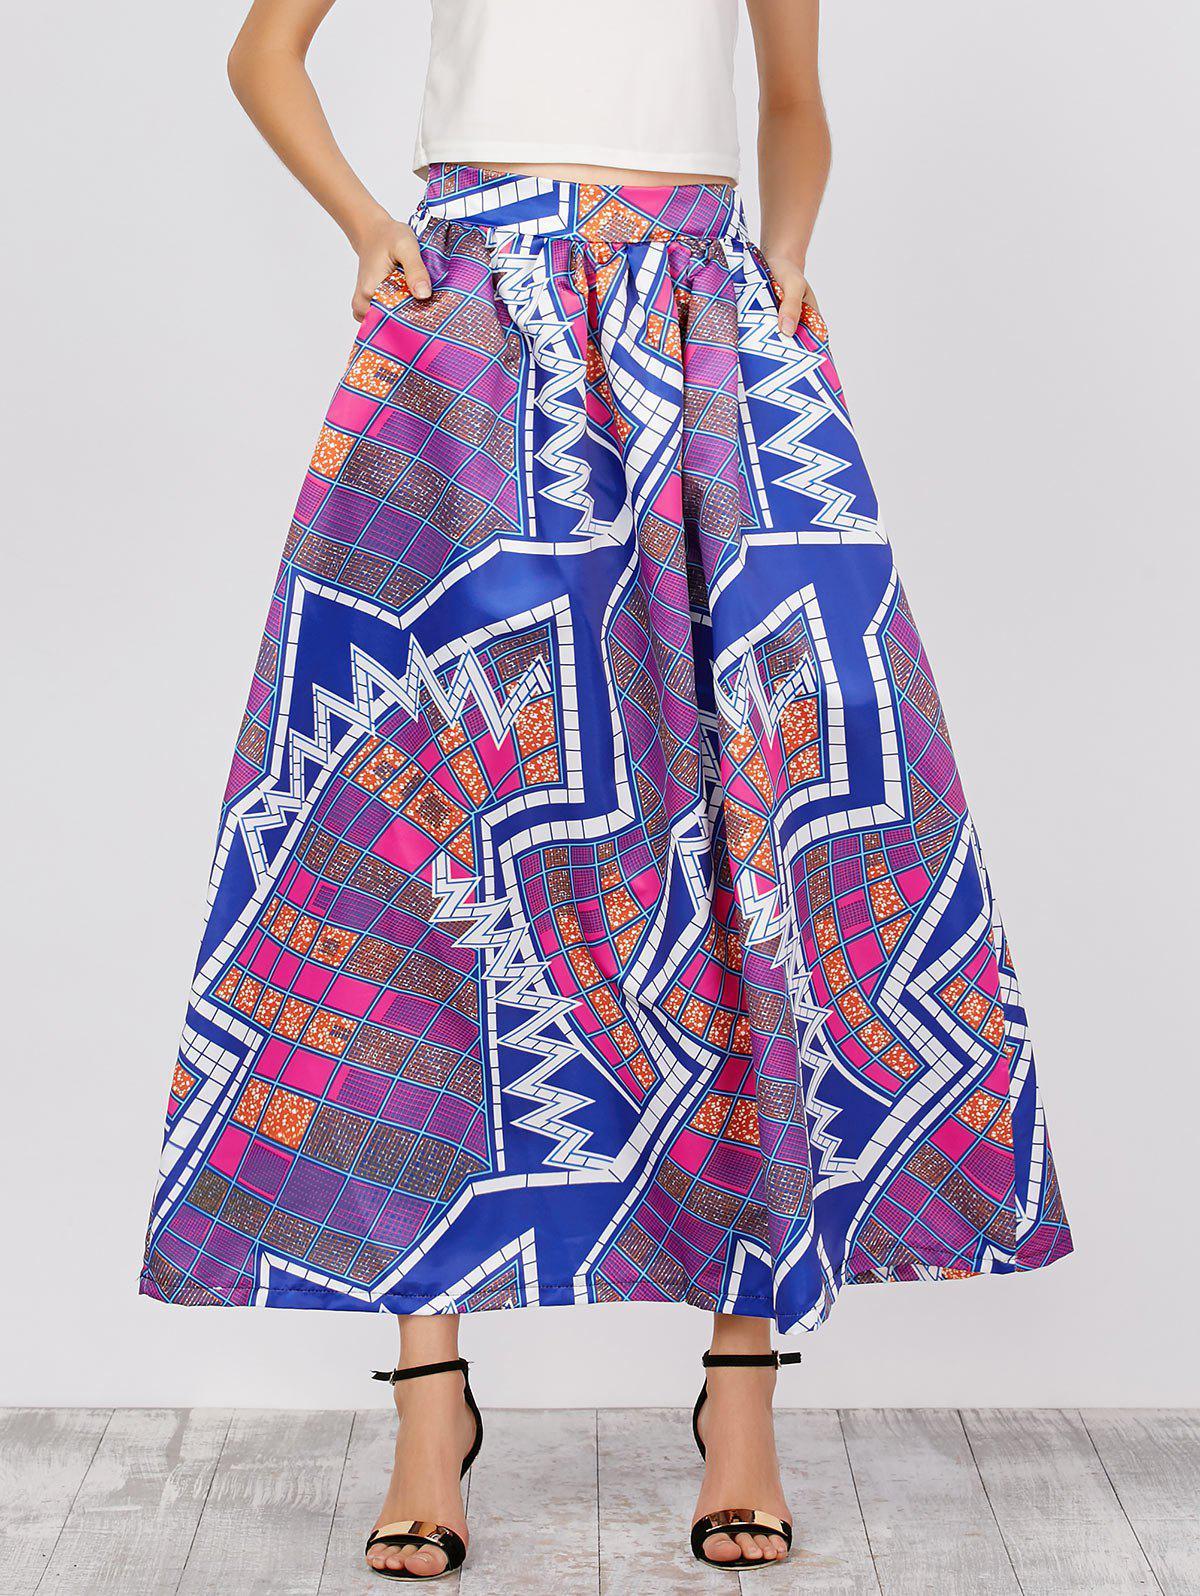 Taille haute Jupes Imprimer africaine